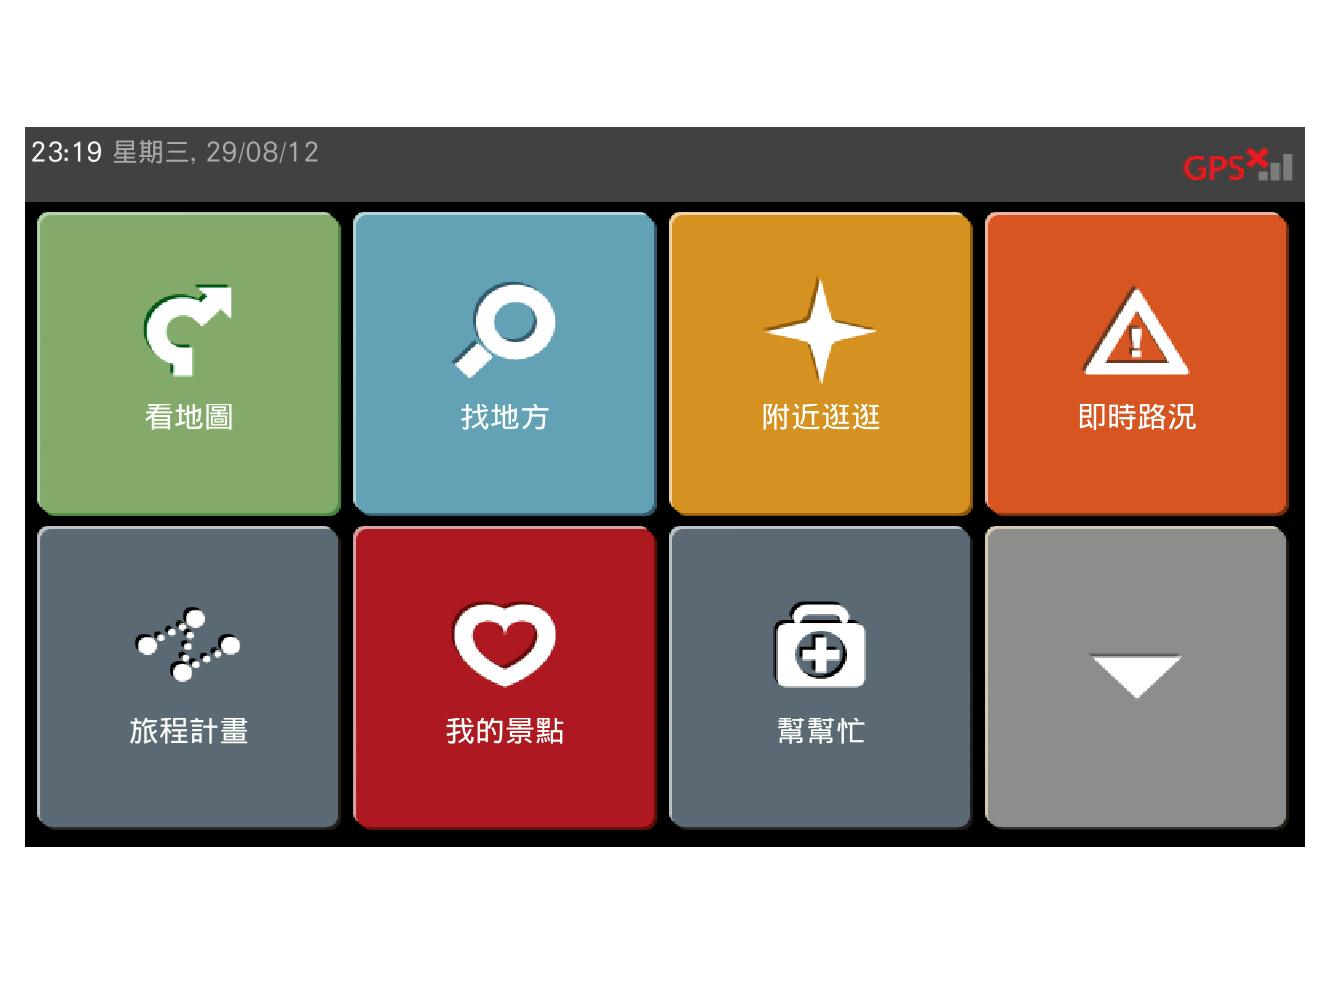 Mio 推出 Android 版導航軟體 MioMap Pro Taiwan ,小編評測報告